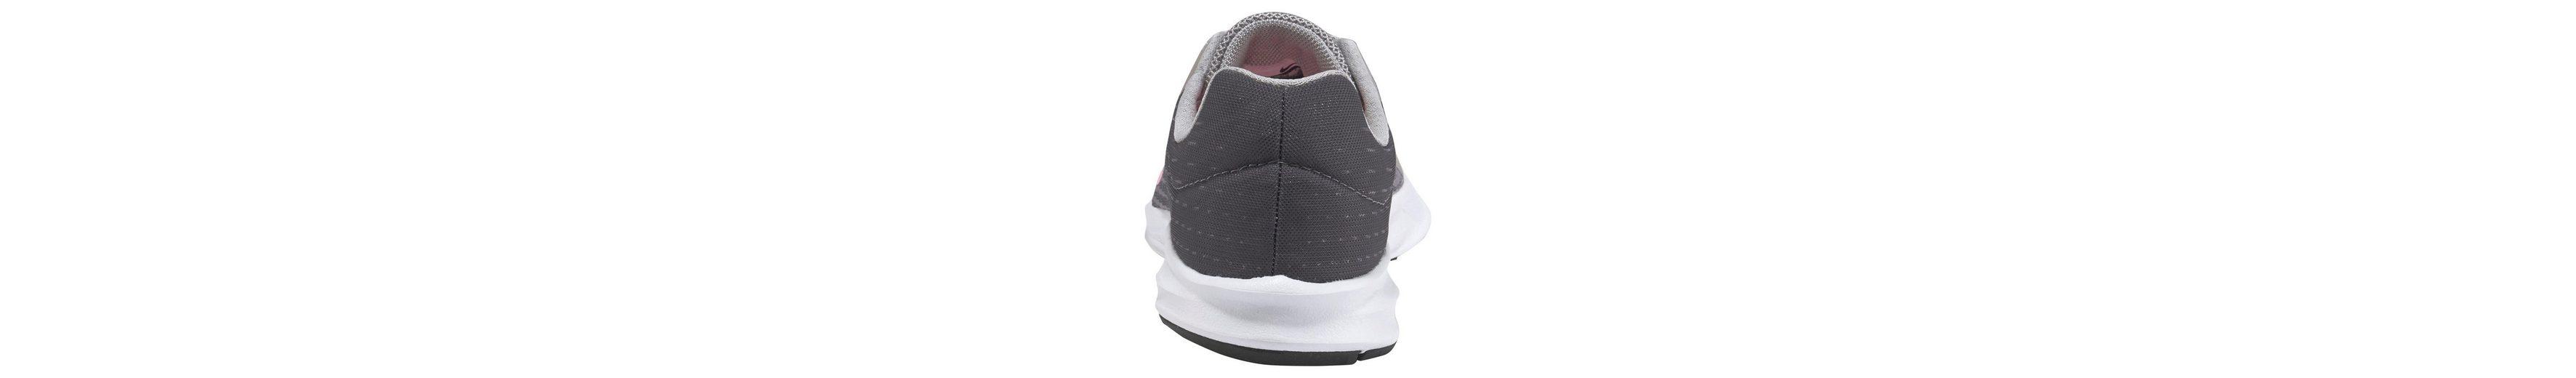 Nike 8 Downshifter Wmns 8 Nike Wmns Wmns 8 Laufschuh Downshifter Downshifter Laufschuh Nike rxrZPUqS